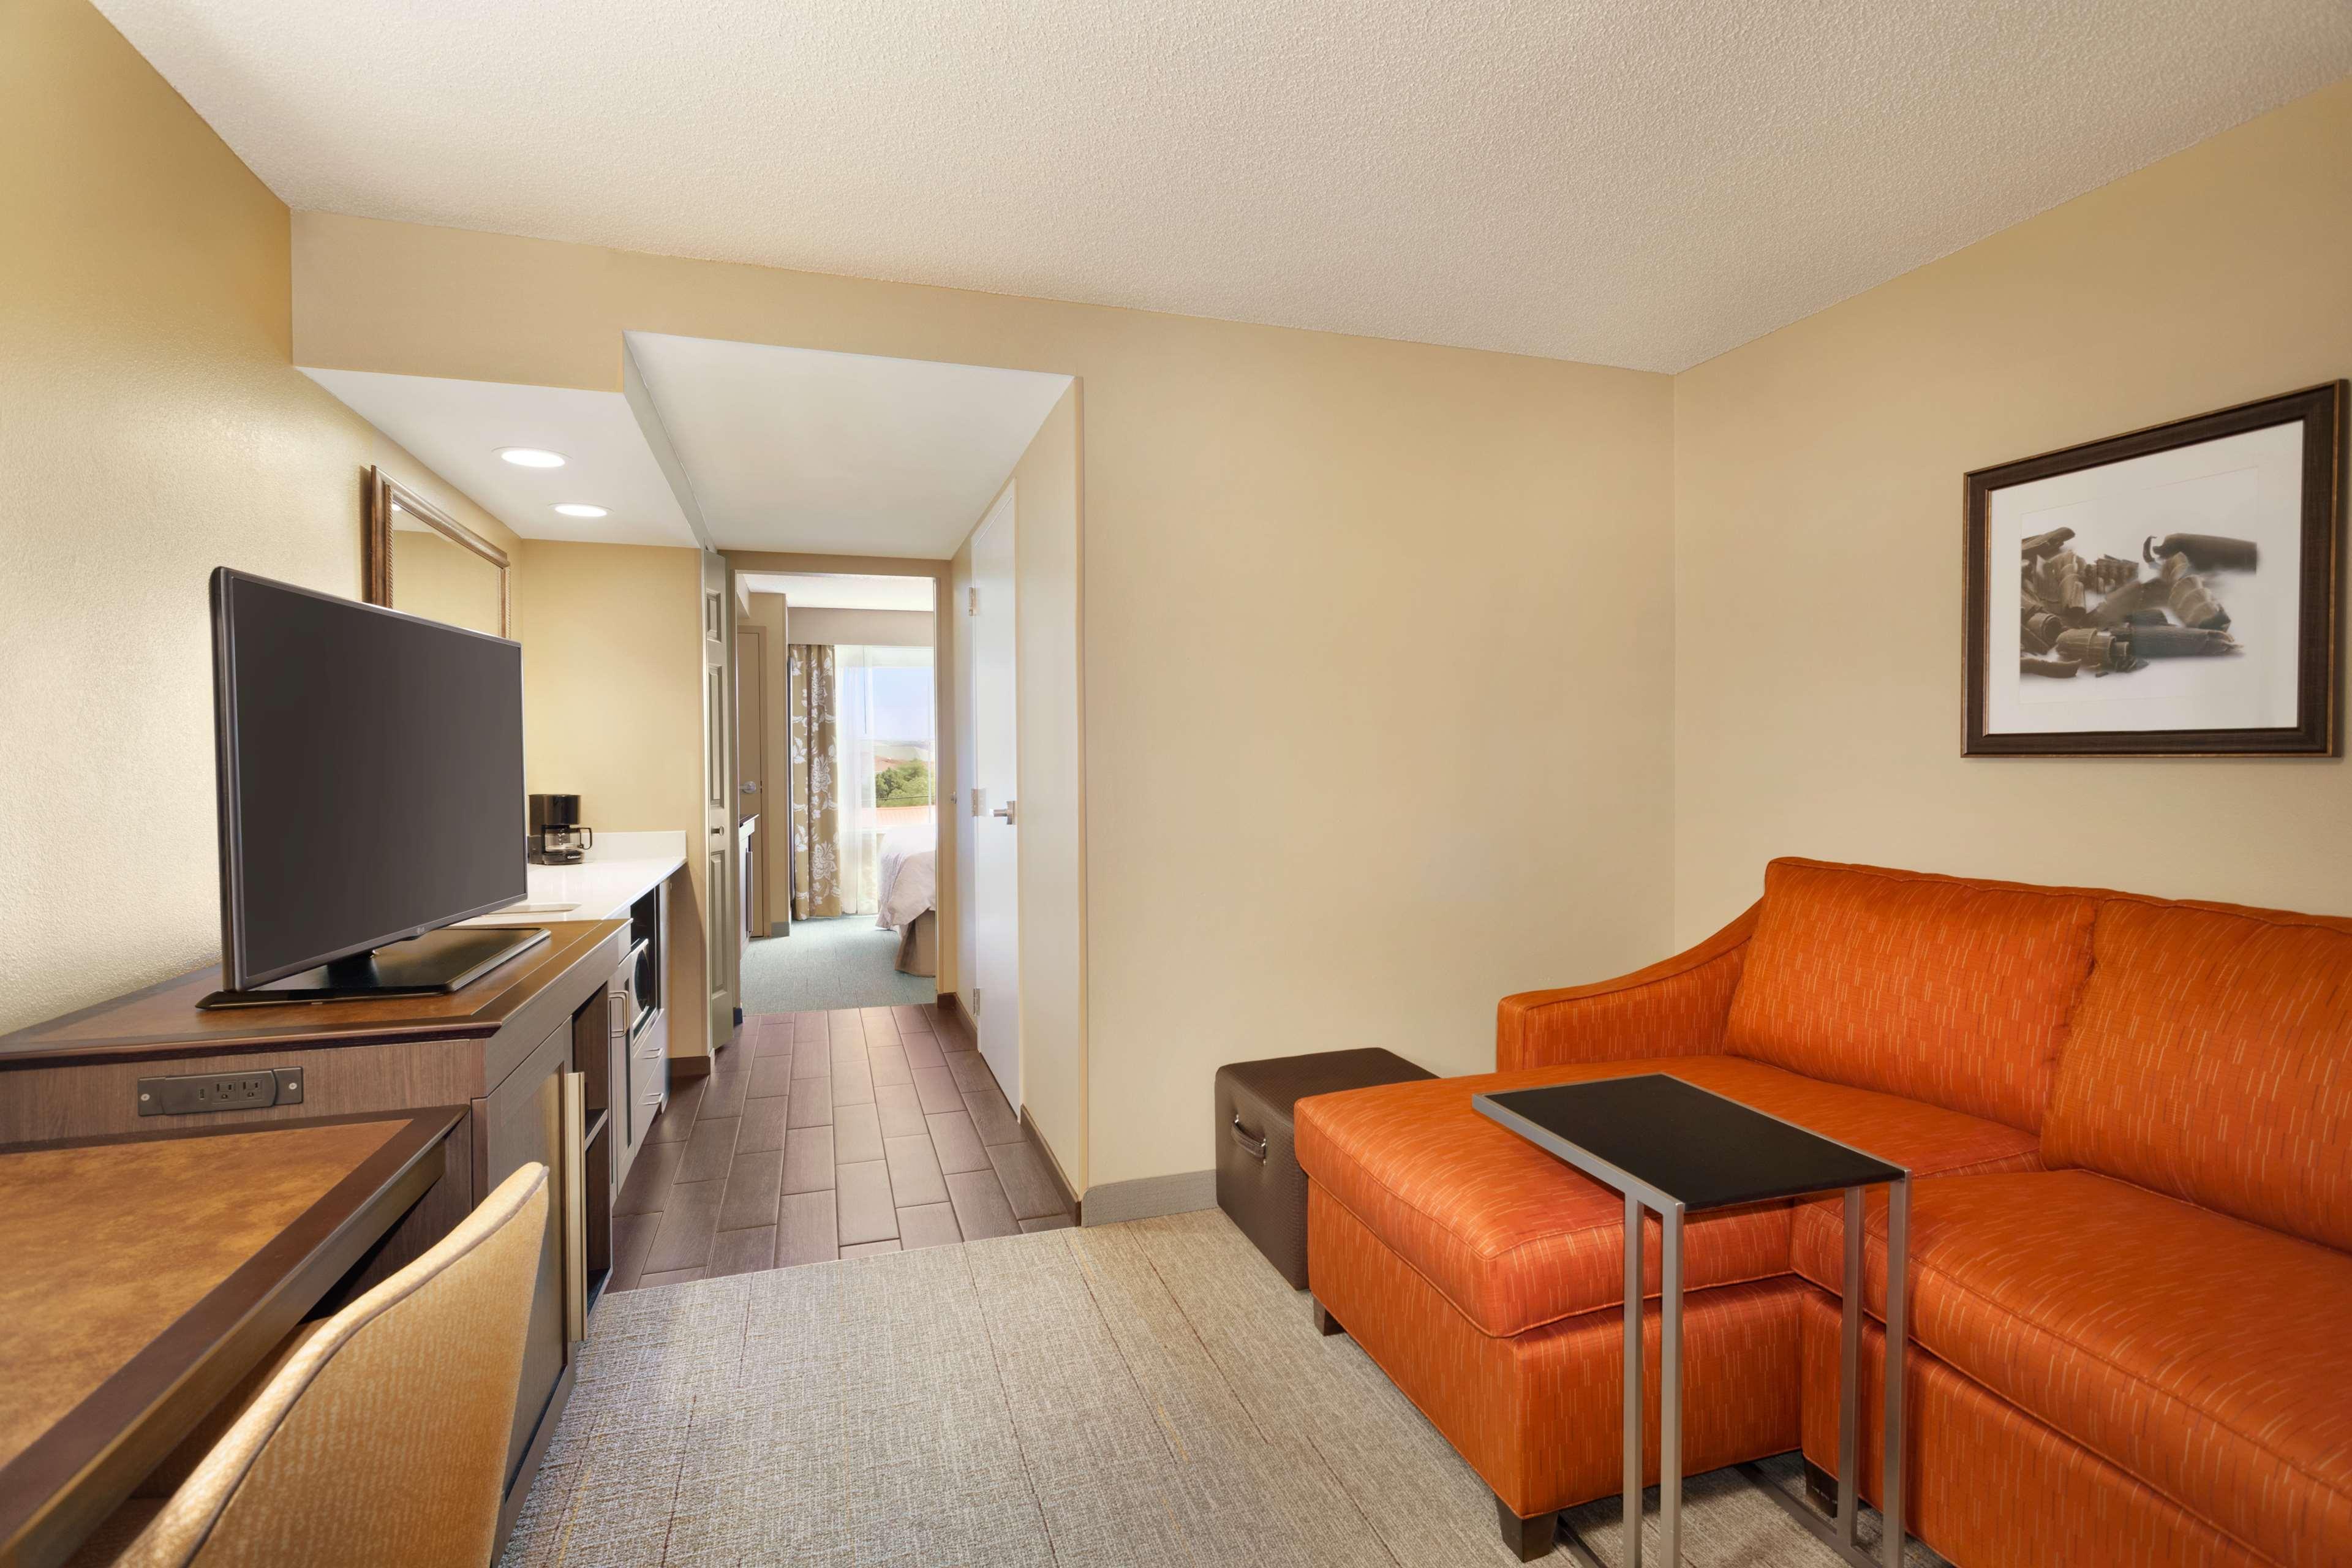 Hampton Inn & Suites Hershey Near The Park image 0